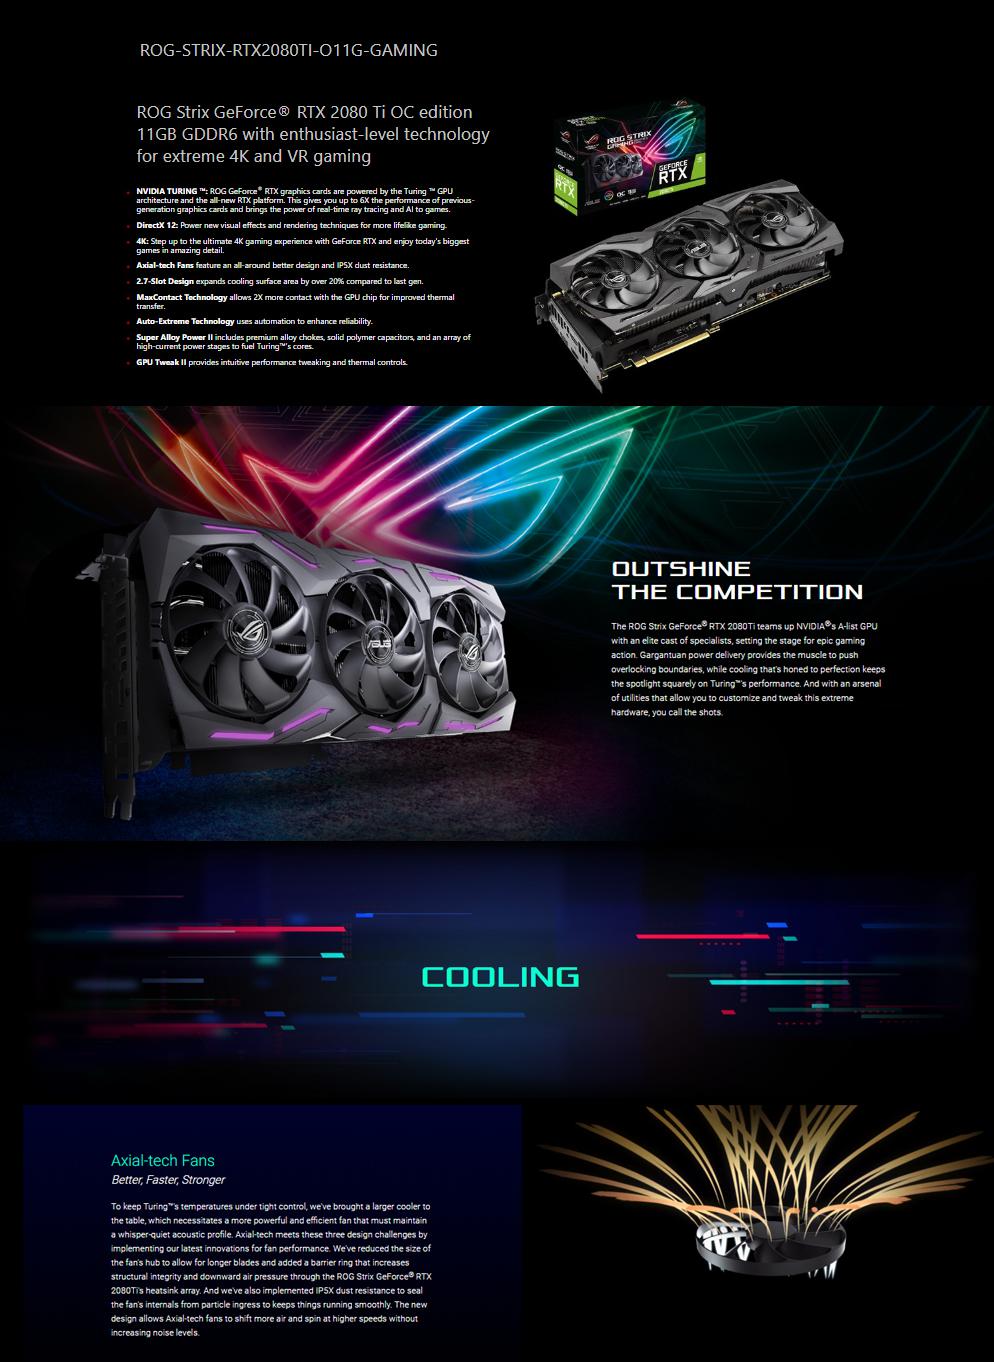 Asus ROG Strix GeForce RTX™ 2080 Ti OC edition 11GB GDDR6